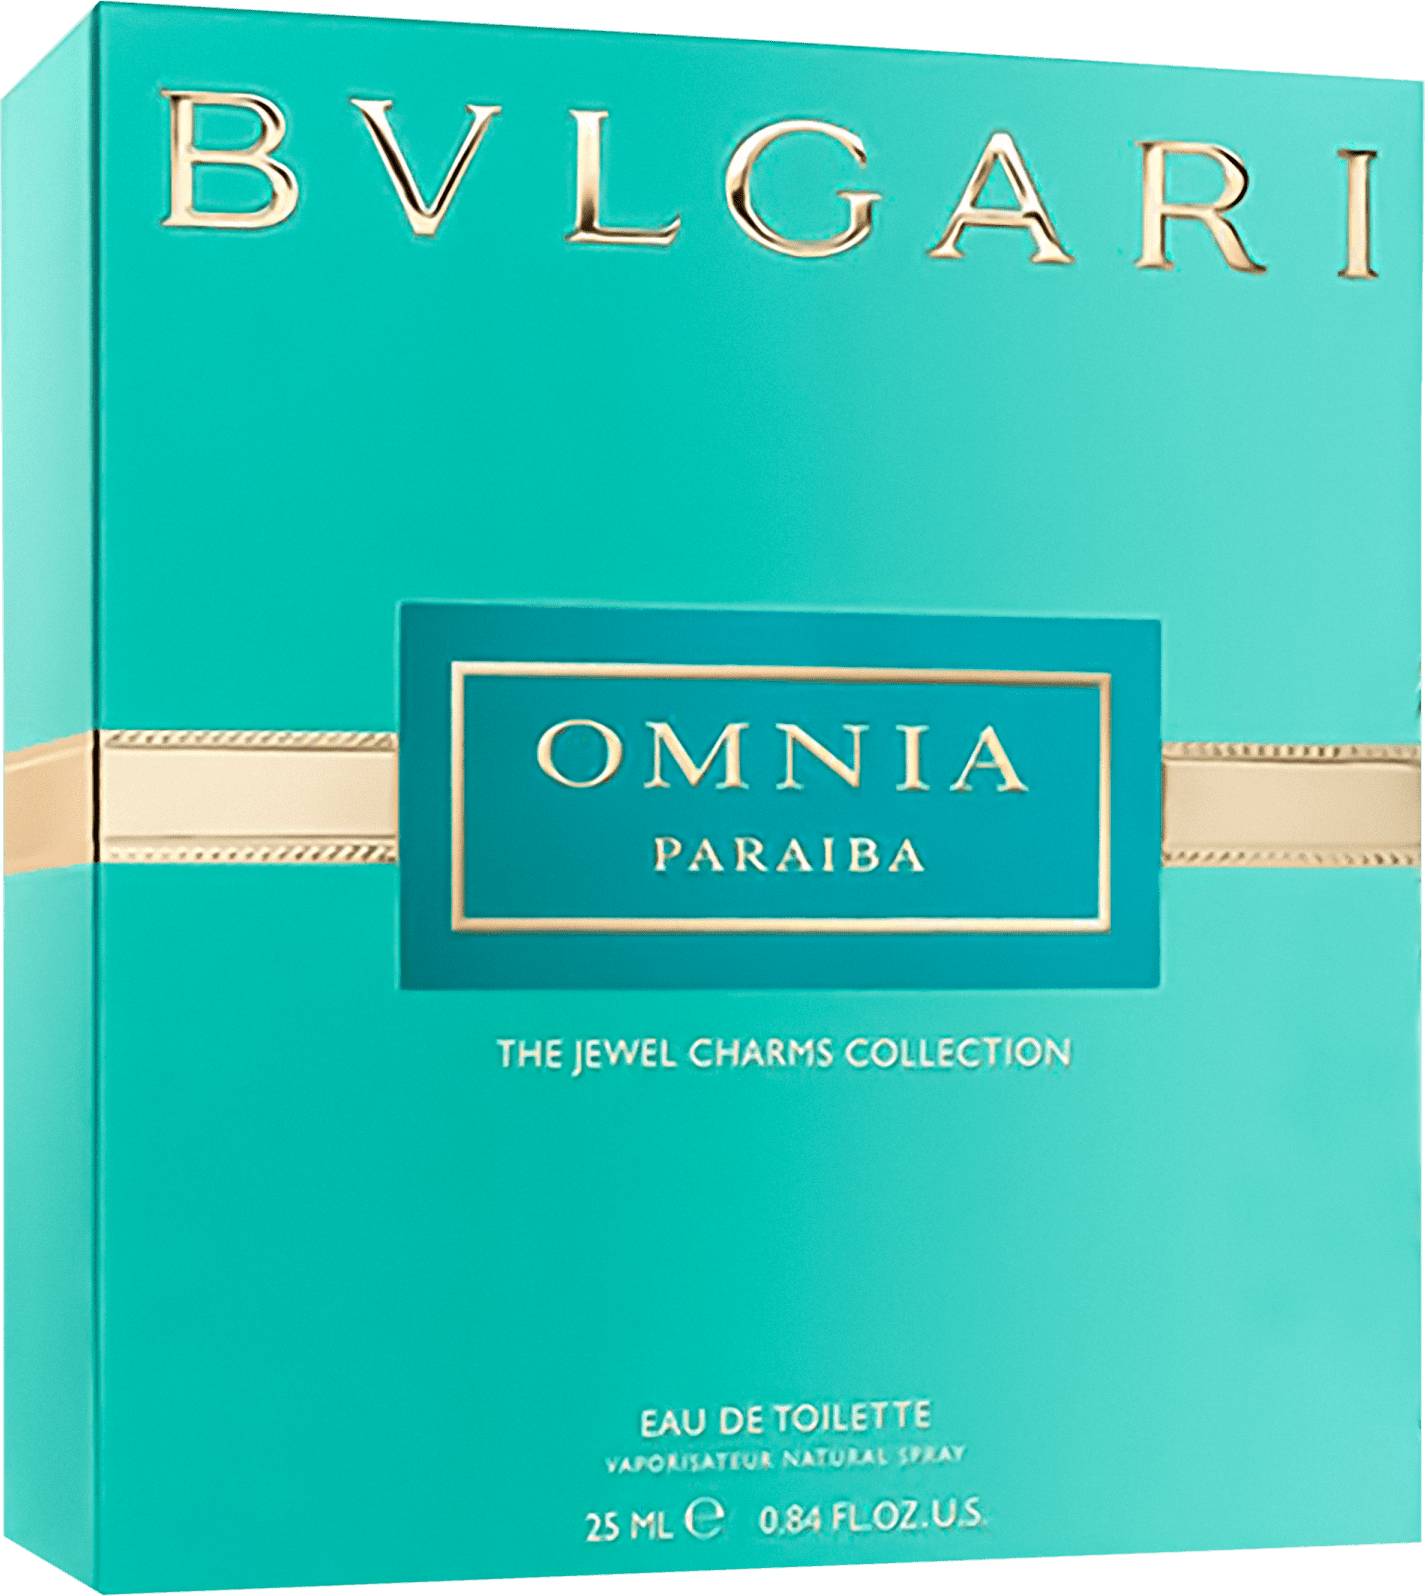 6284711387fc8 Omnia Tourmaline Paraiba Bvlgari Eau de Toilette - Perfume Feminino 25ml